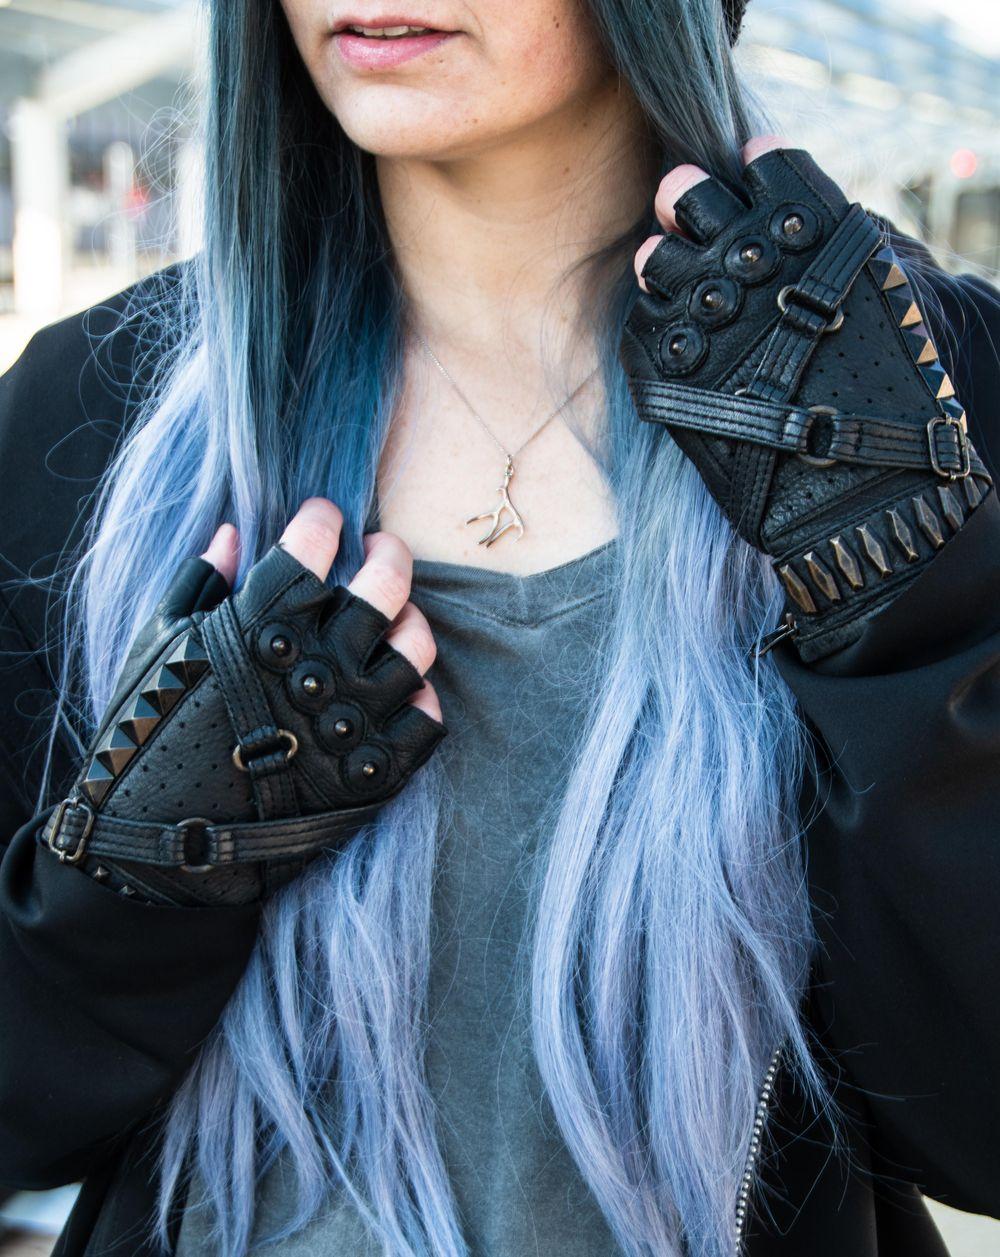 Cyberpunk Fashion Lookbook - image 2 - student project